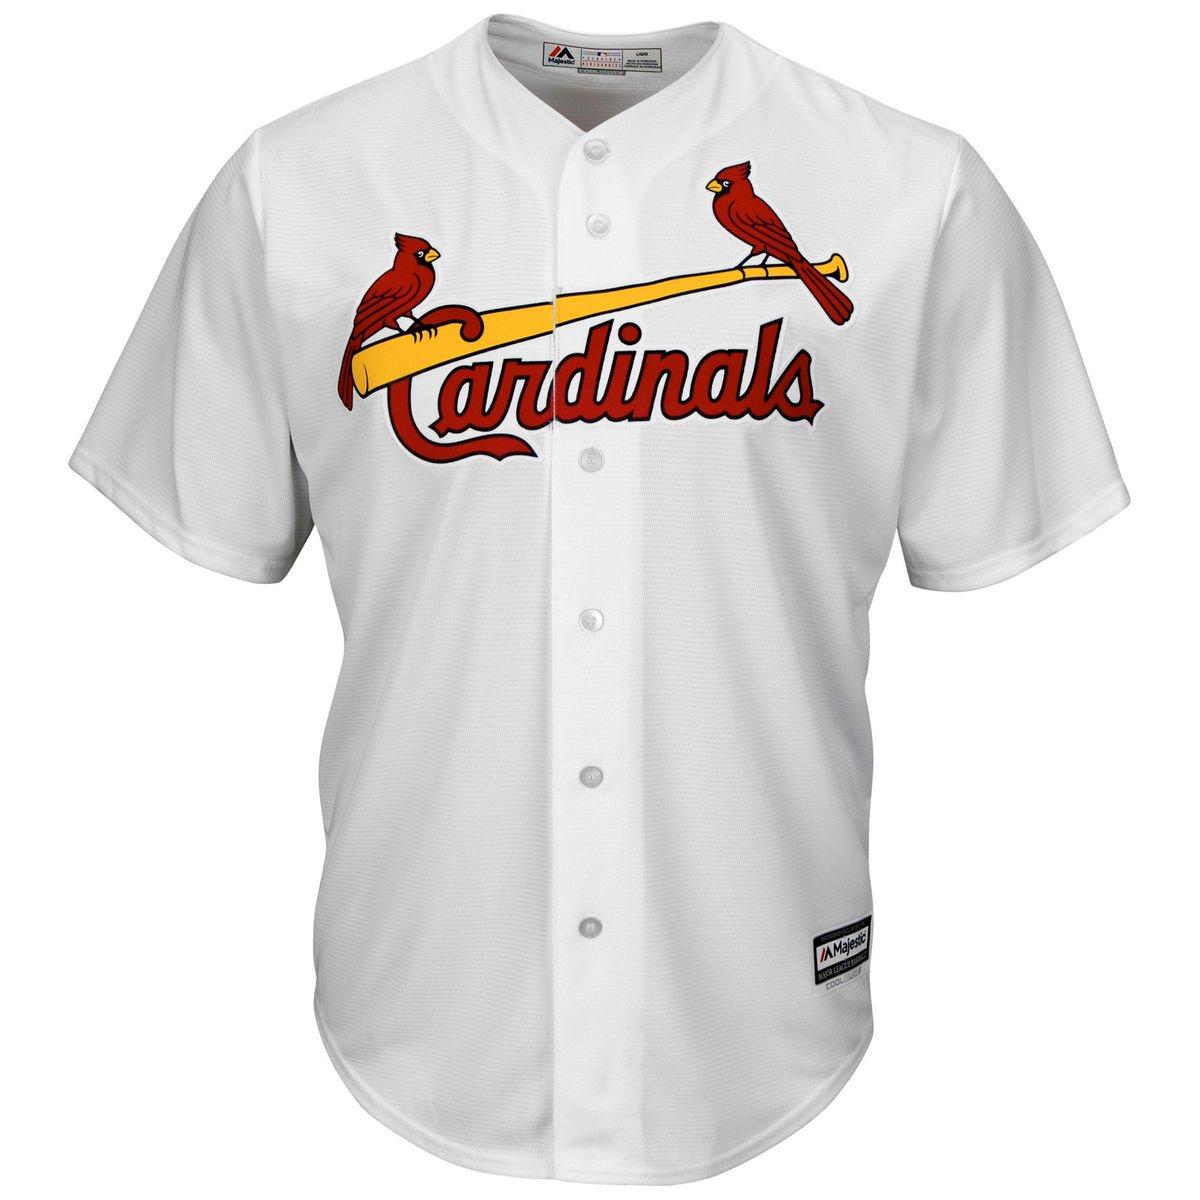 Louis Cardinals Youth Cool Baseホームチームジャージーホワイト B00U2N6EI2Medium